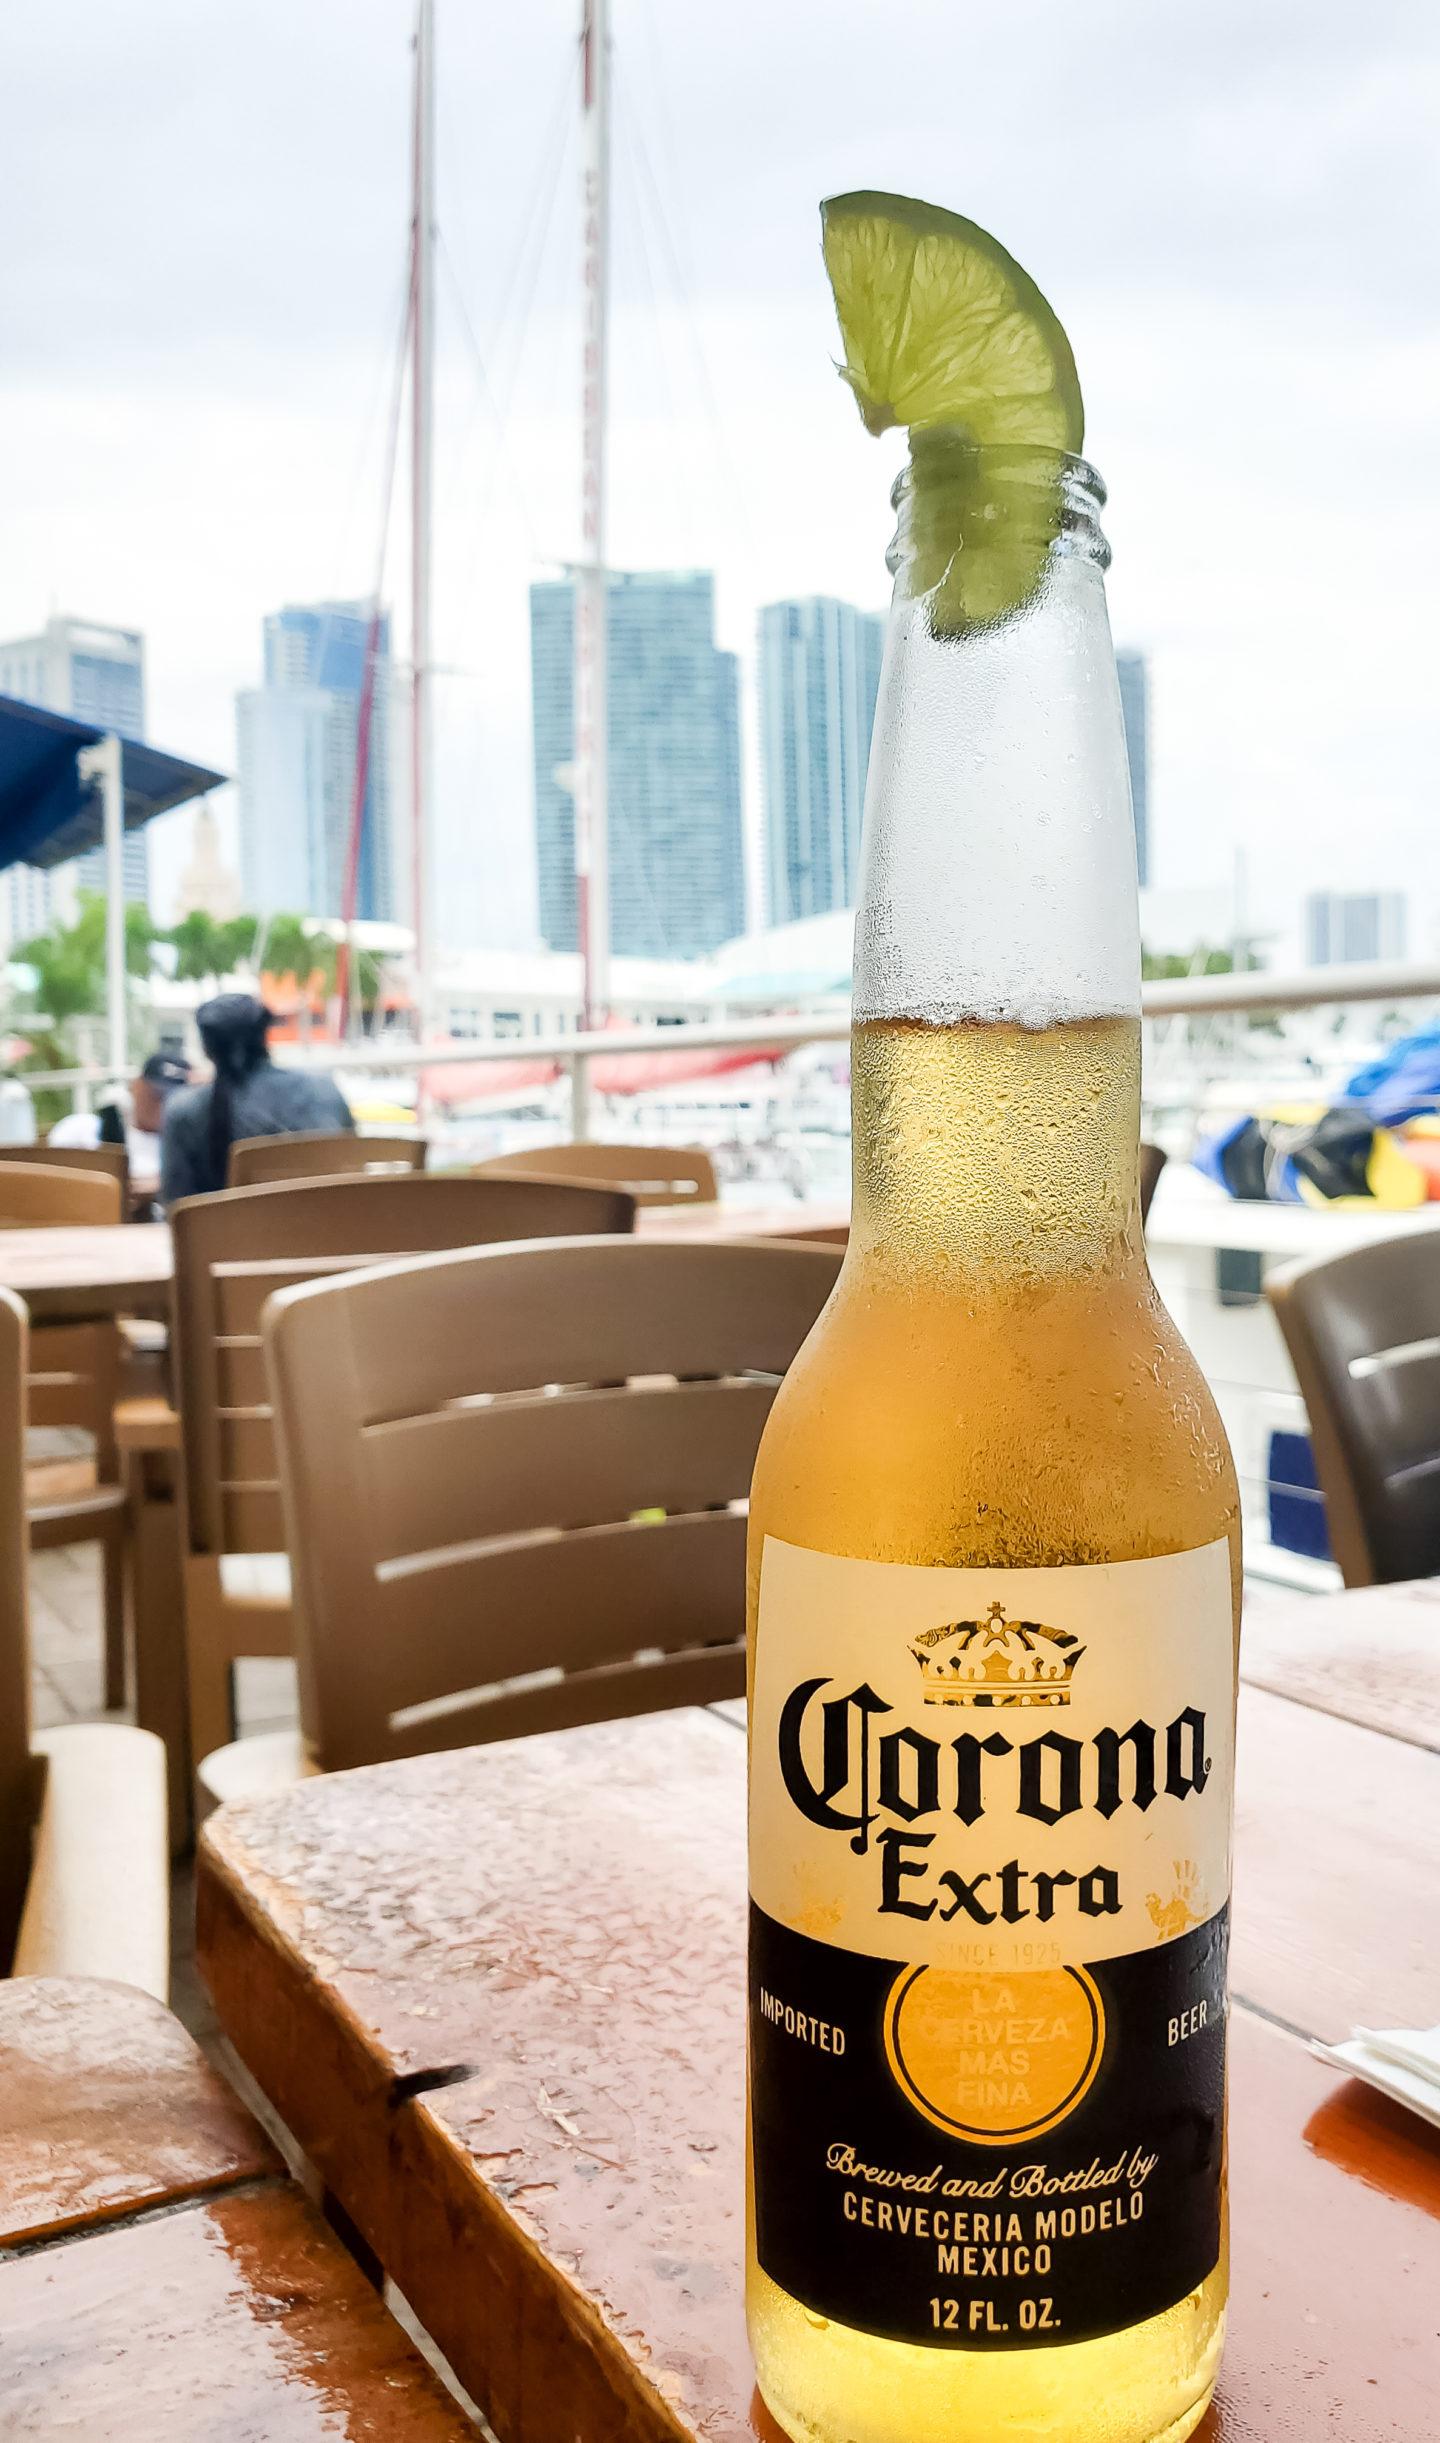 Cold Corona beer